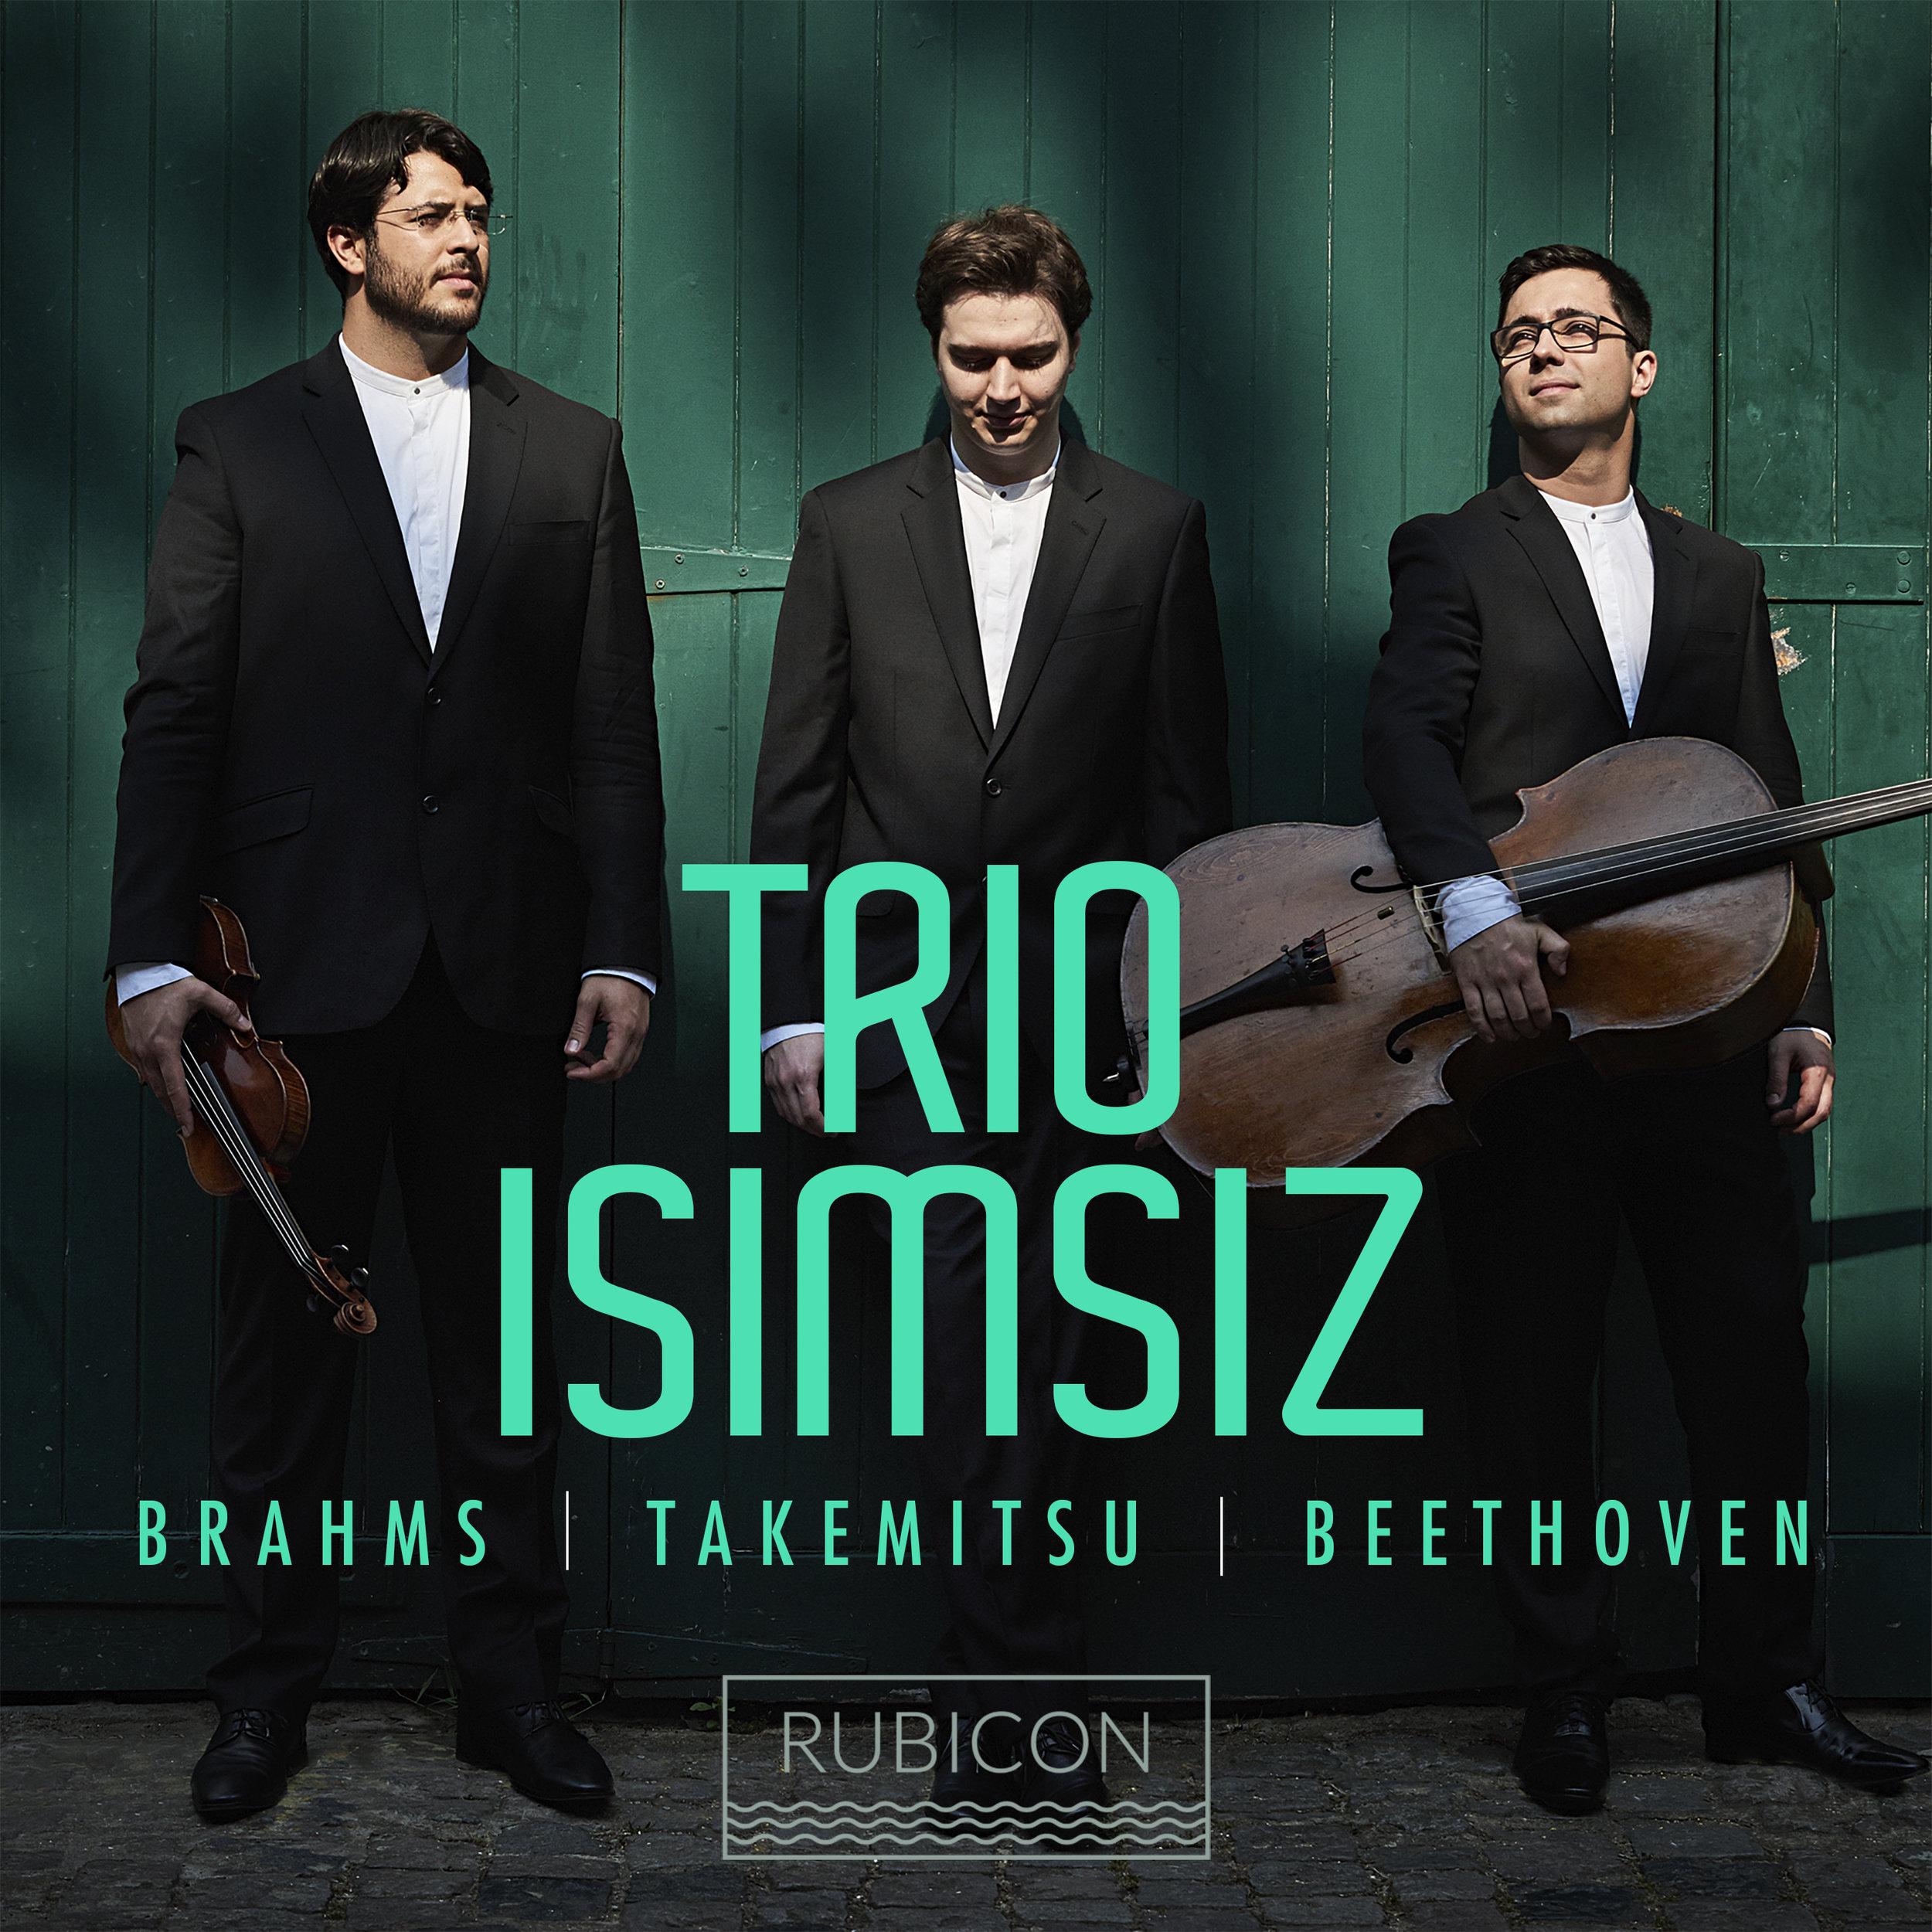 Rubicon_Trio_Isimzis_CD_Cover_12_3000px.jpg